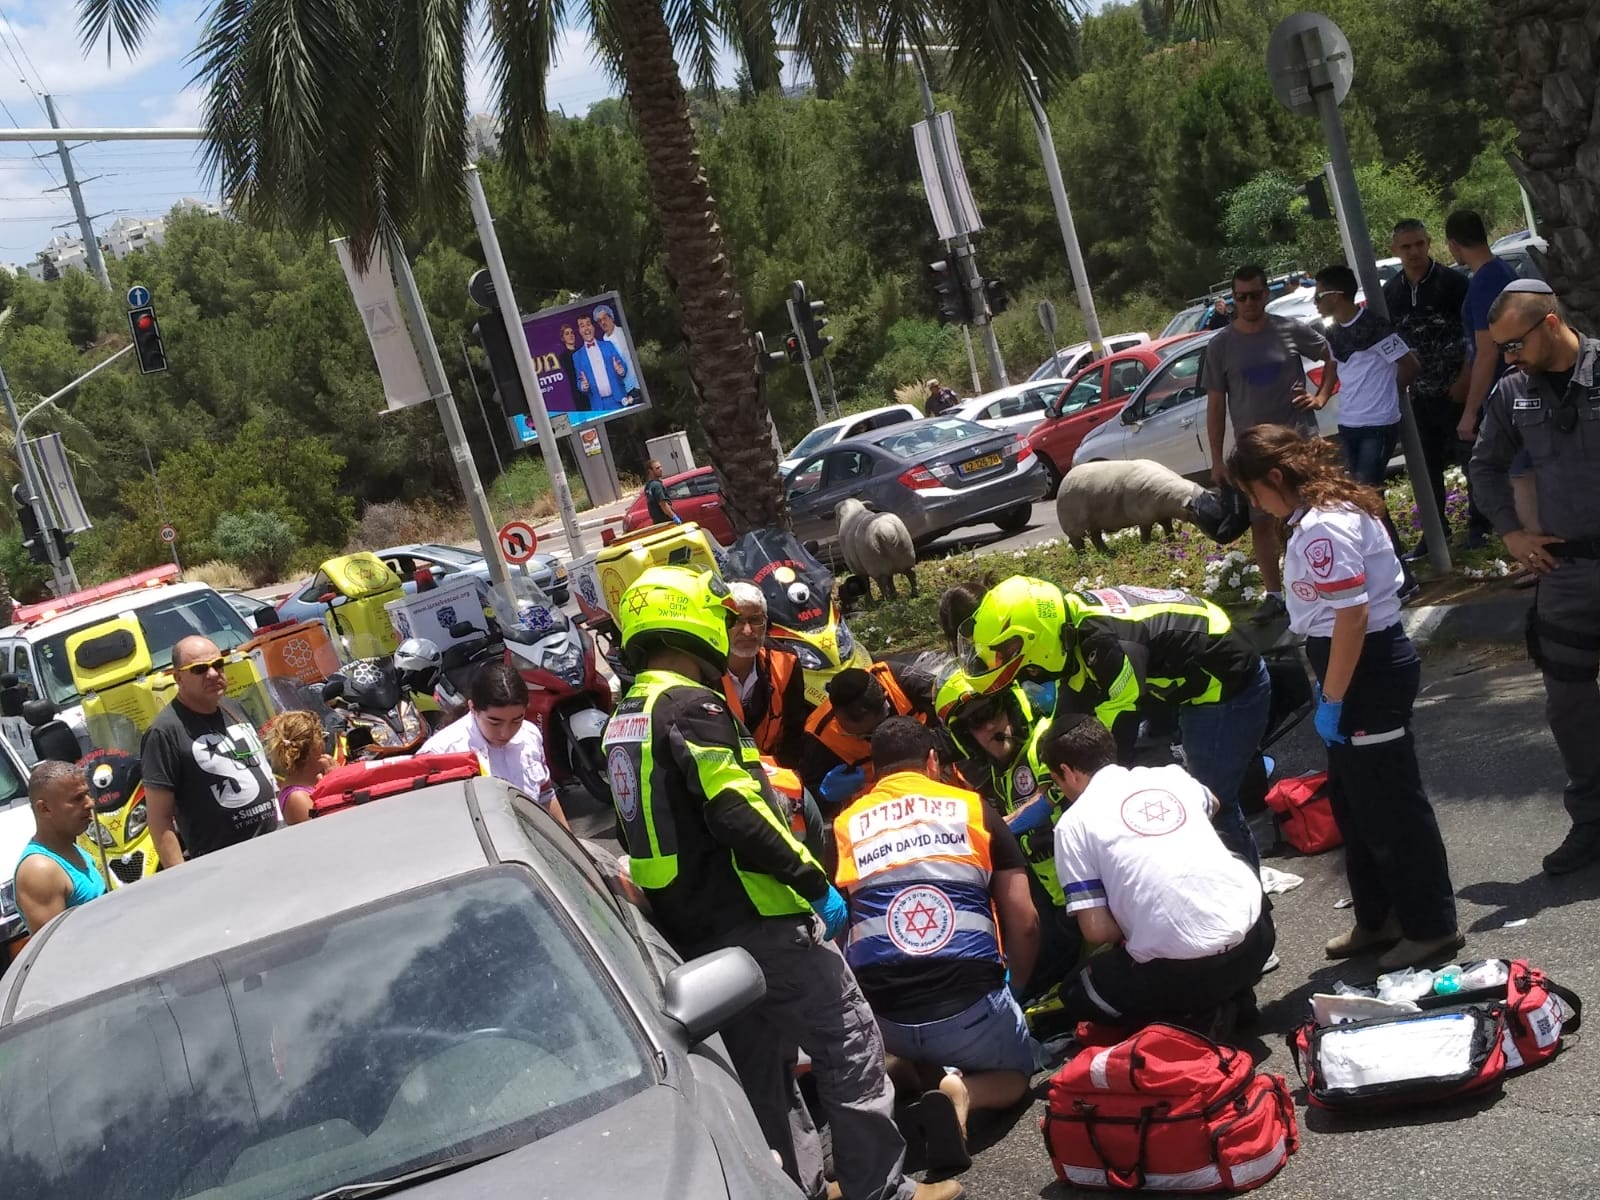 Photo of תאונה קטלנית בקיבוץ גלויות בראש העין. רוכב אופנוע נהרג בהתנגשות עם רכב פרטי